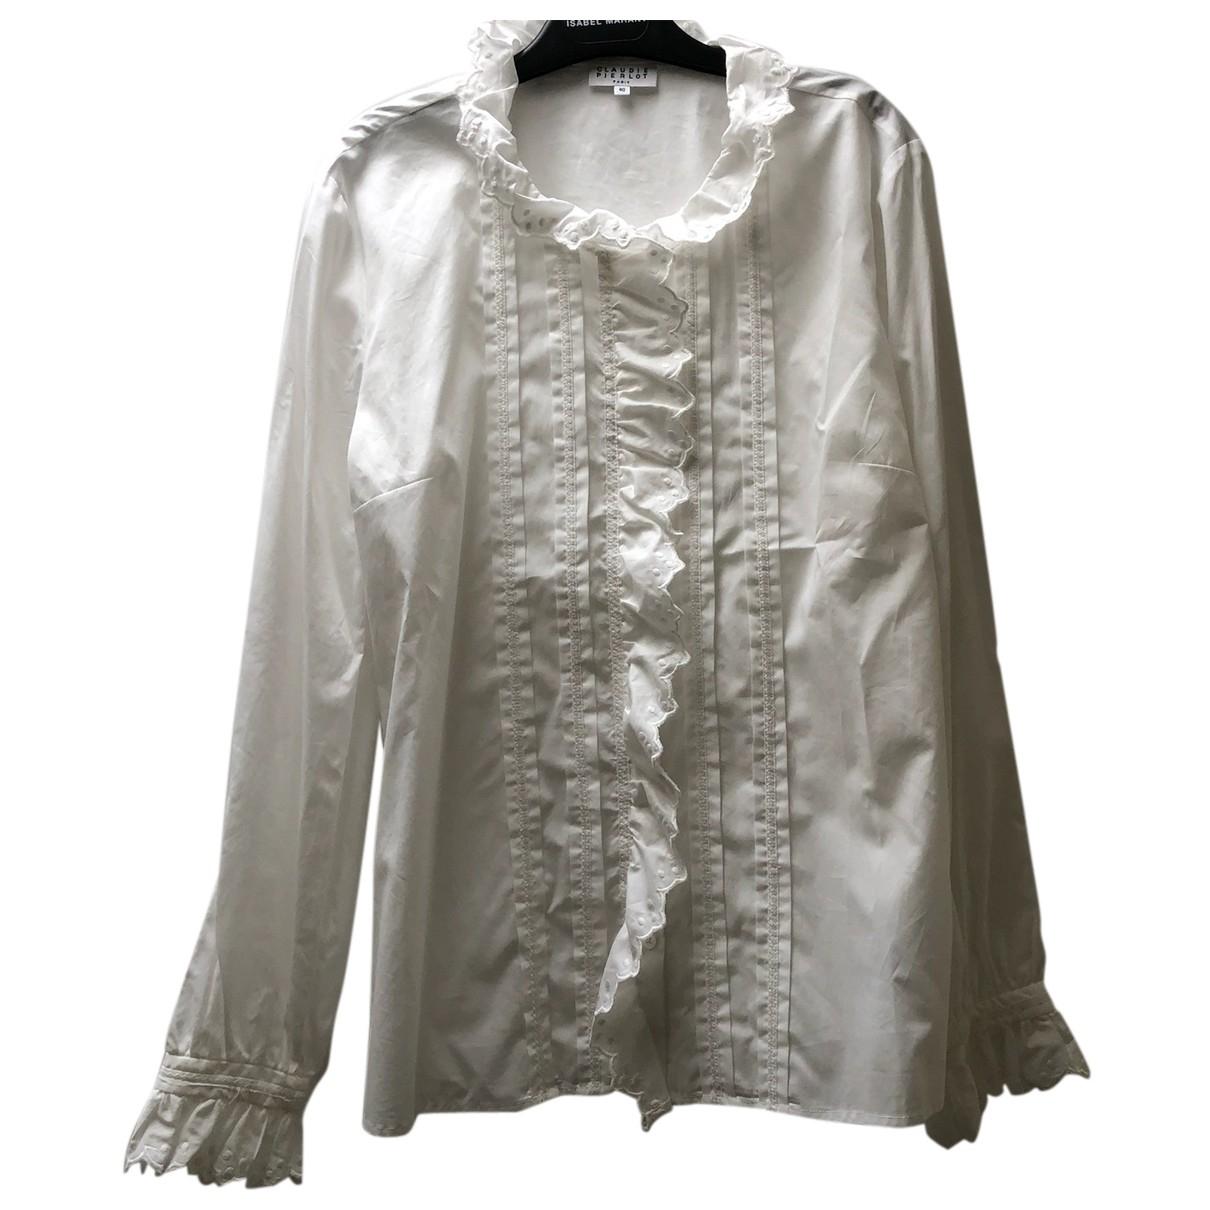 Claudie Pierlot Spring Summer 2020 White Cotton  top for Women 40 FR